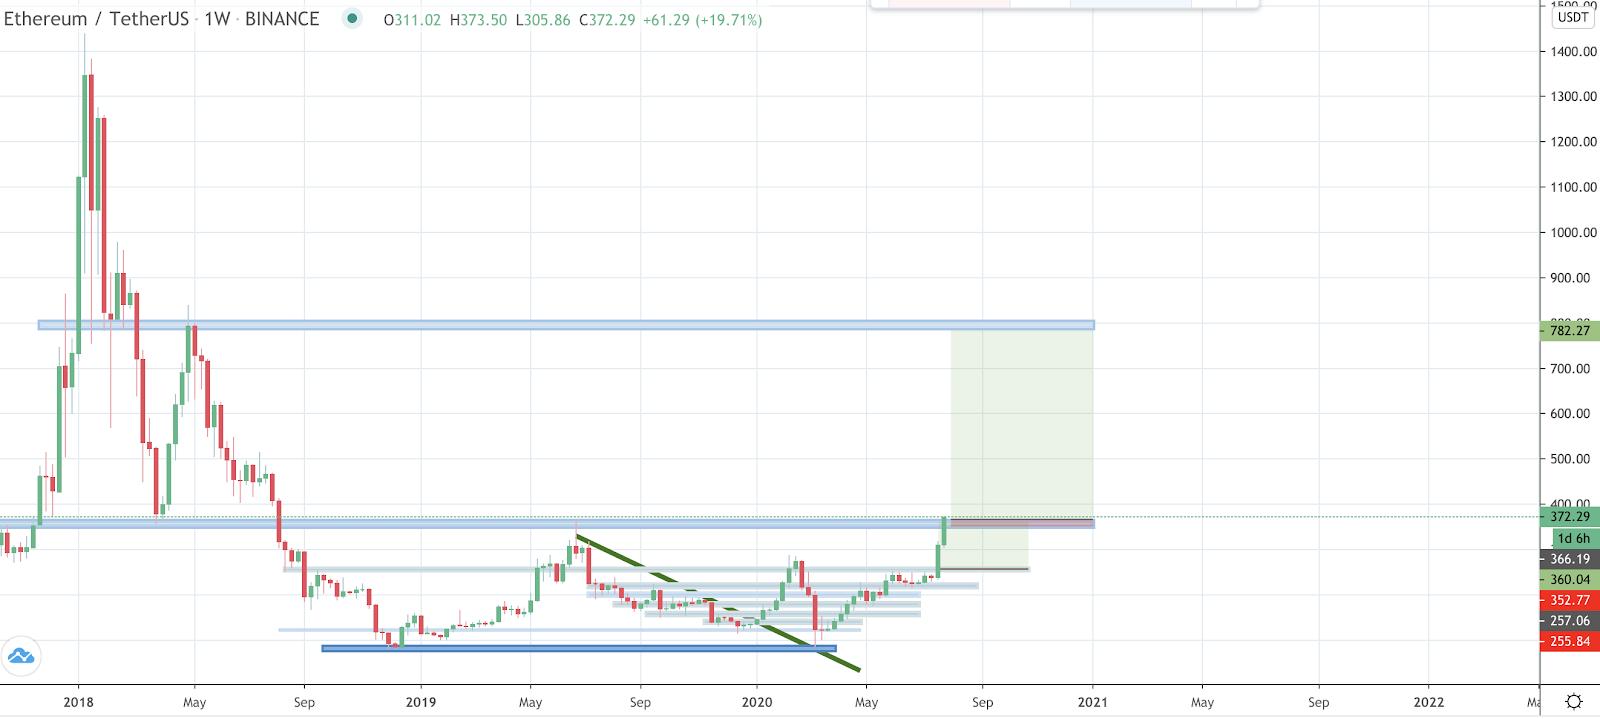 ETH-USD 1-week chart. Source: Satoshi Flipper